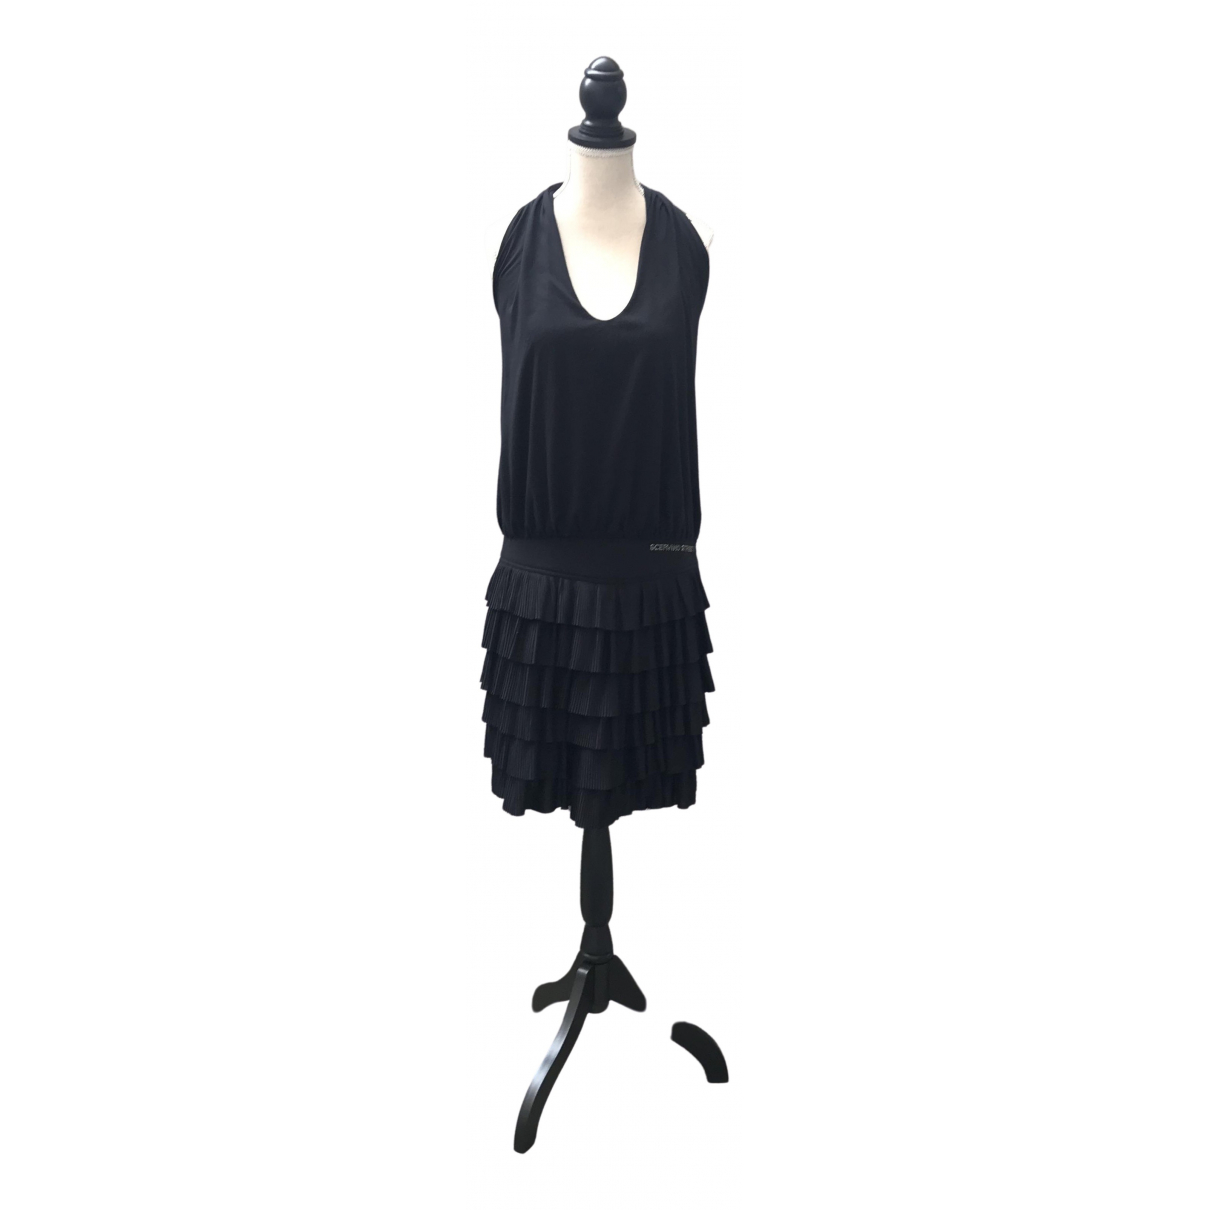 Ermanno Scervino \N Black dress for Women 42 IT